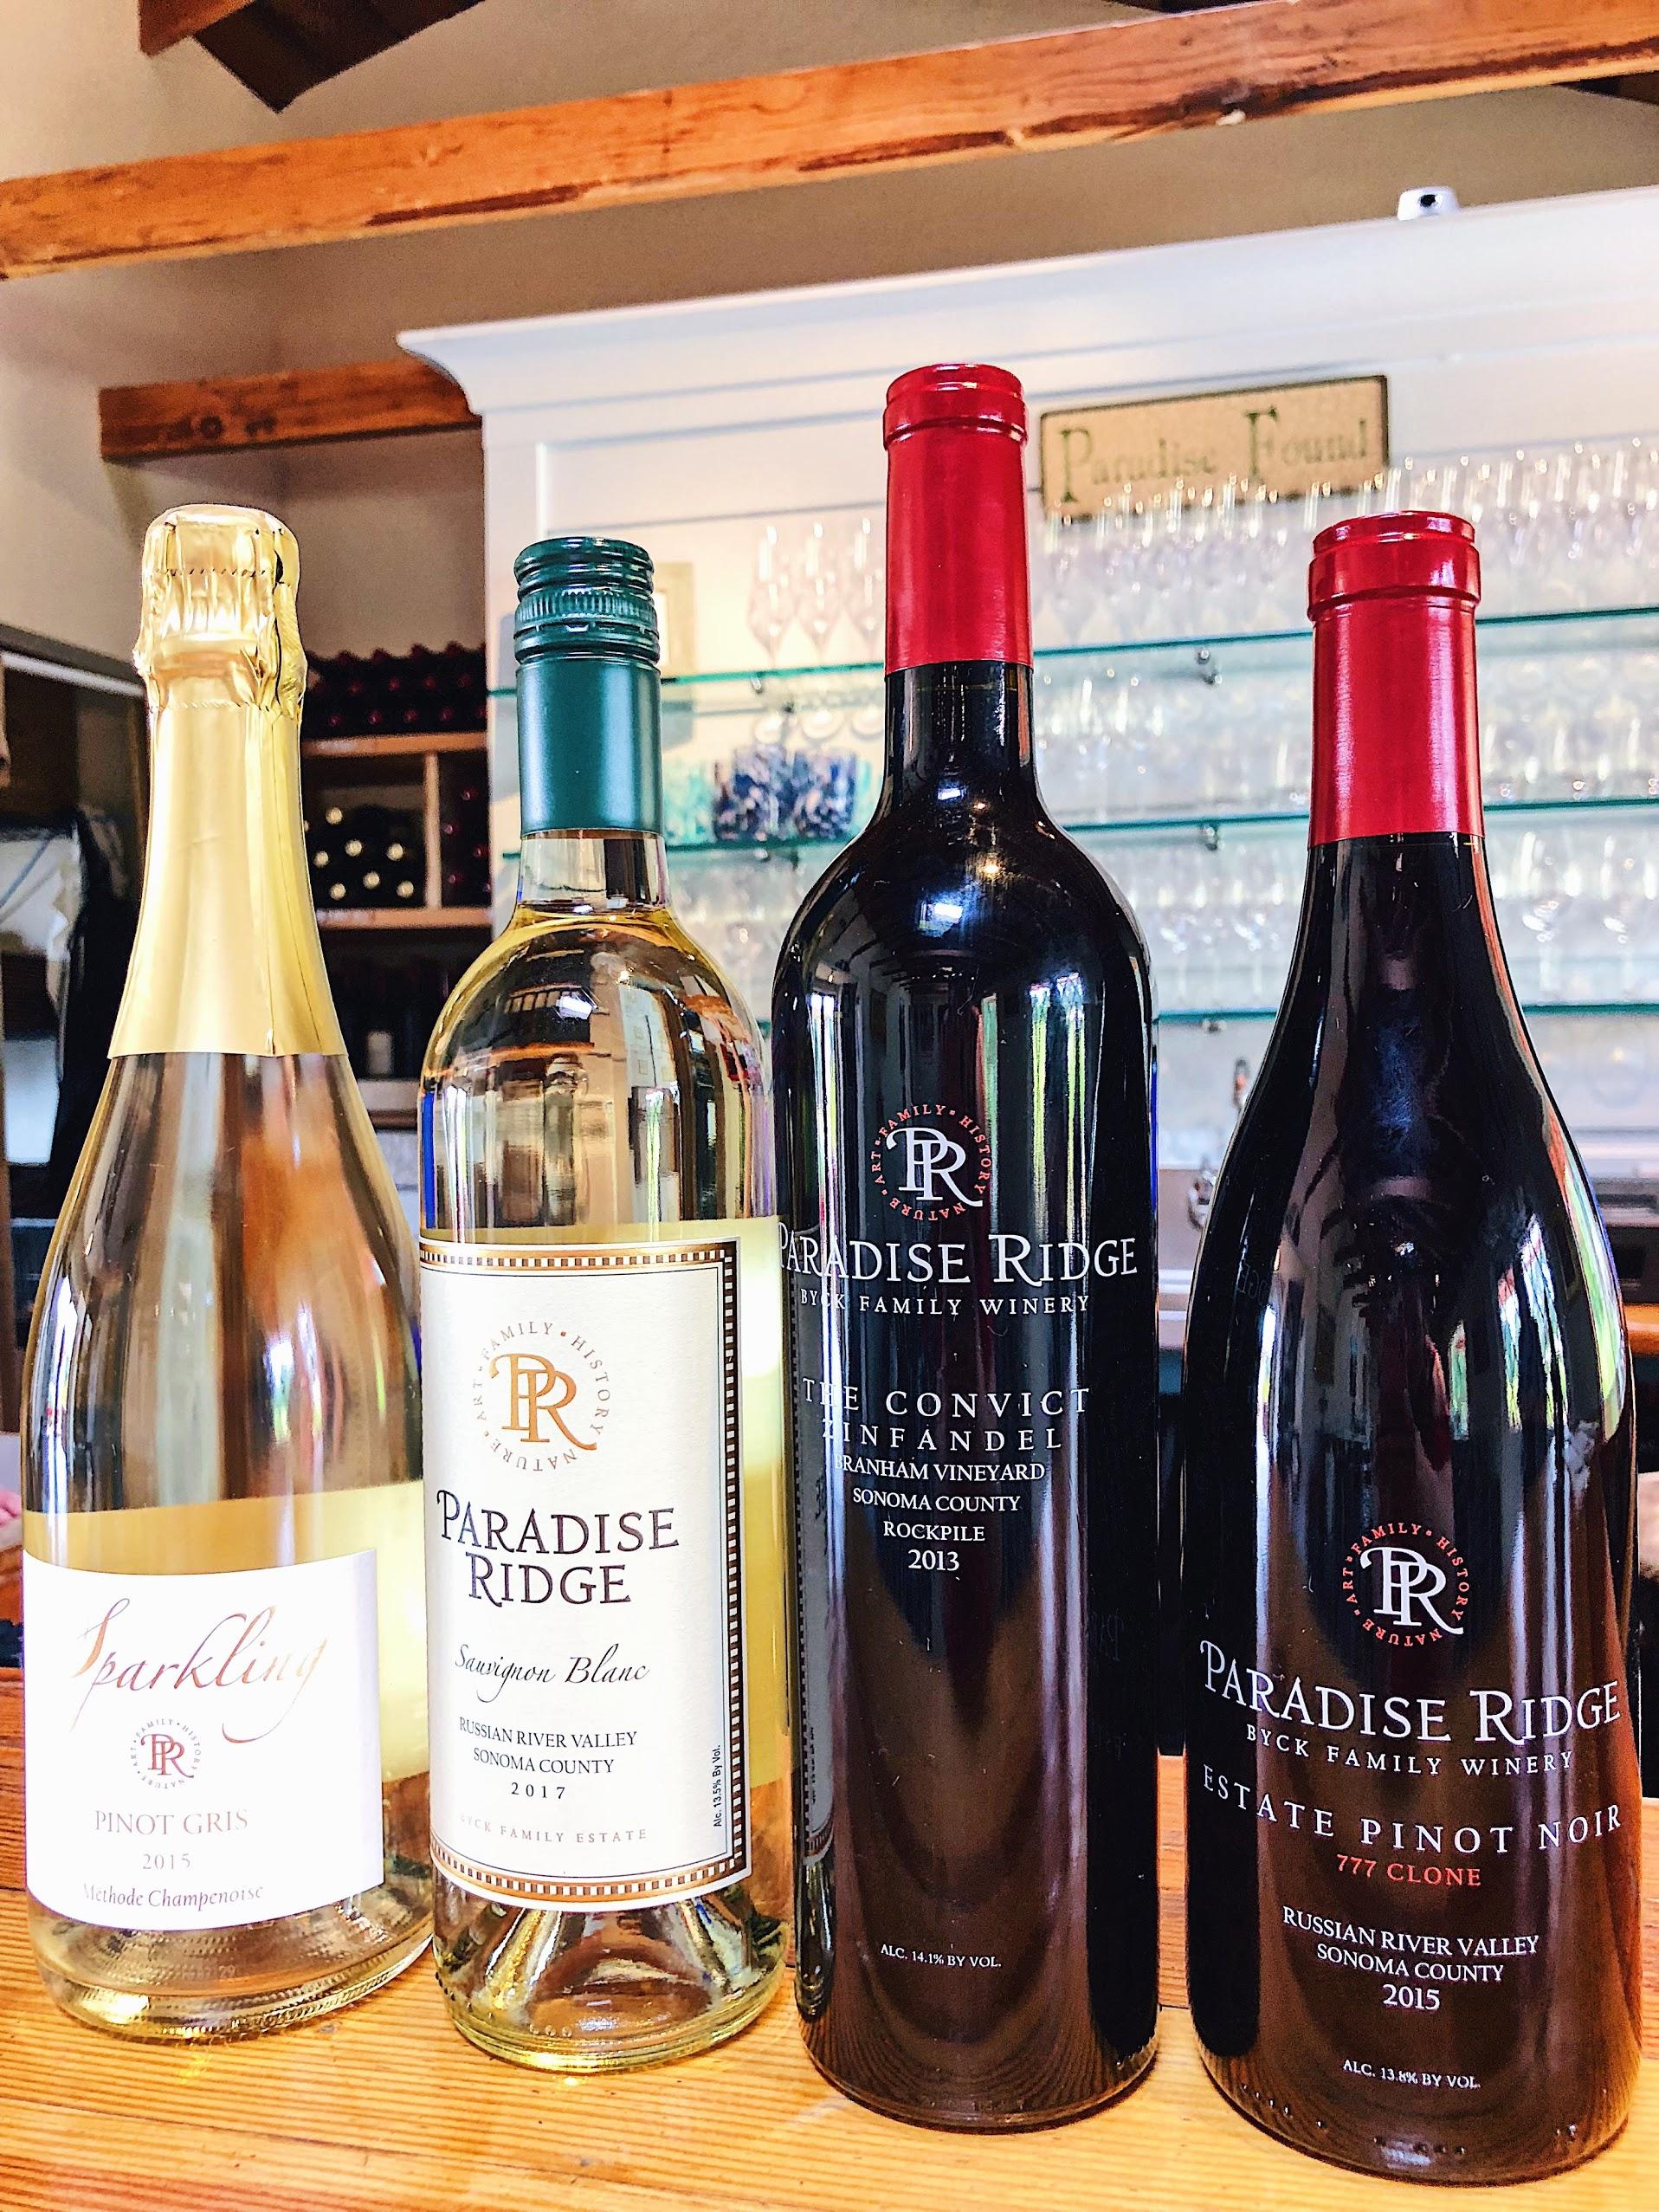 Paradise Ridge Wine Sparkling Sauvignon Blanc Pinot